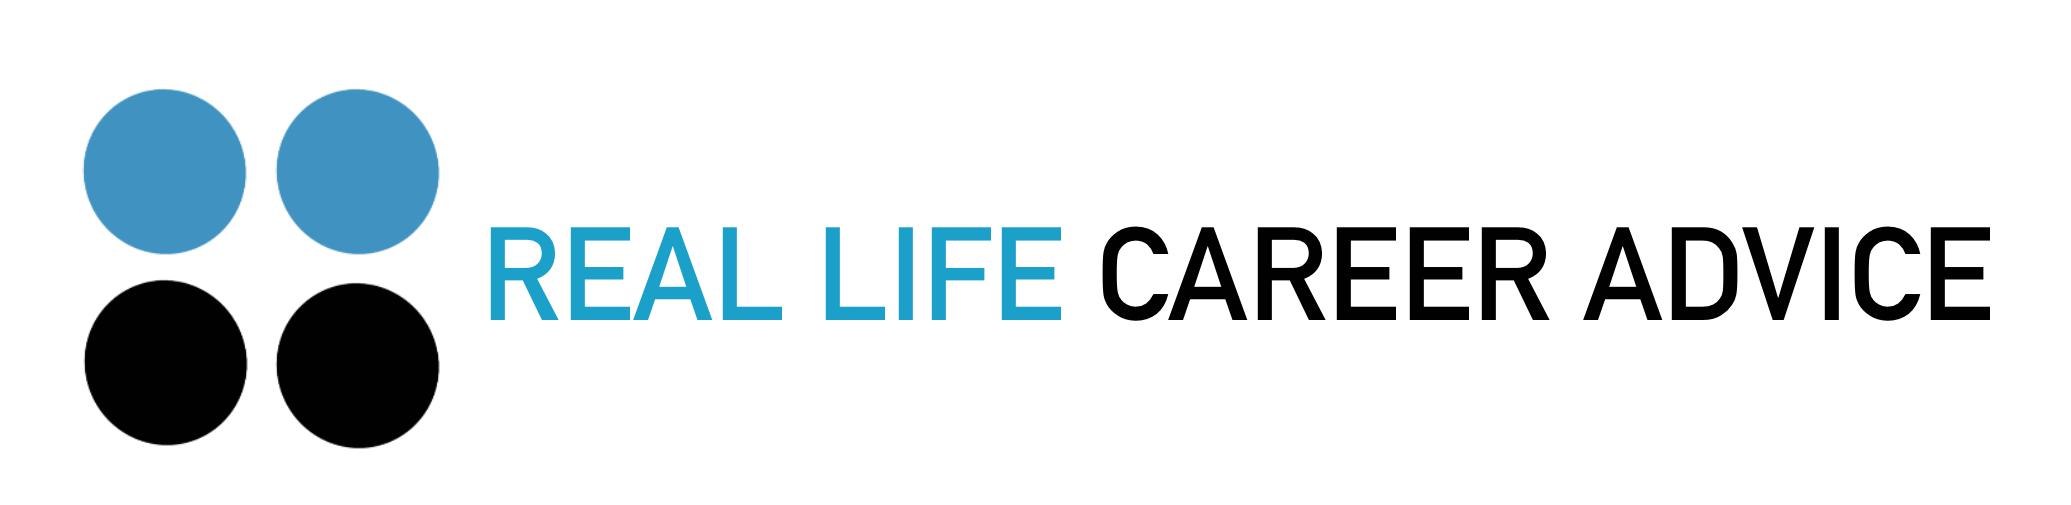 Real Life Career Advice Logo